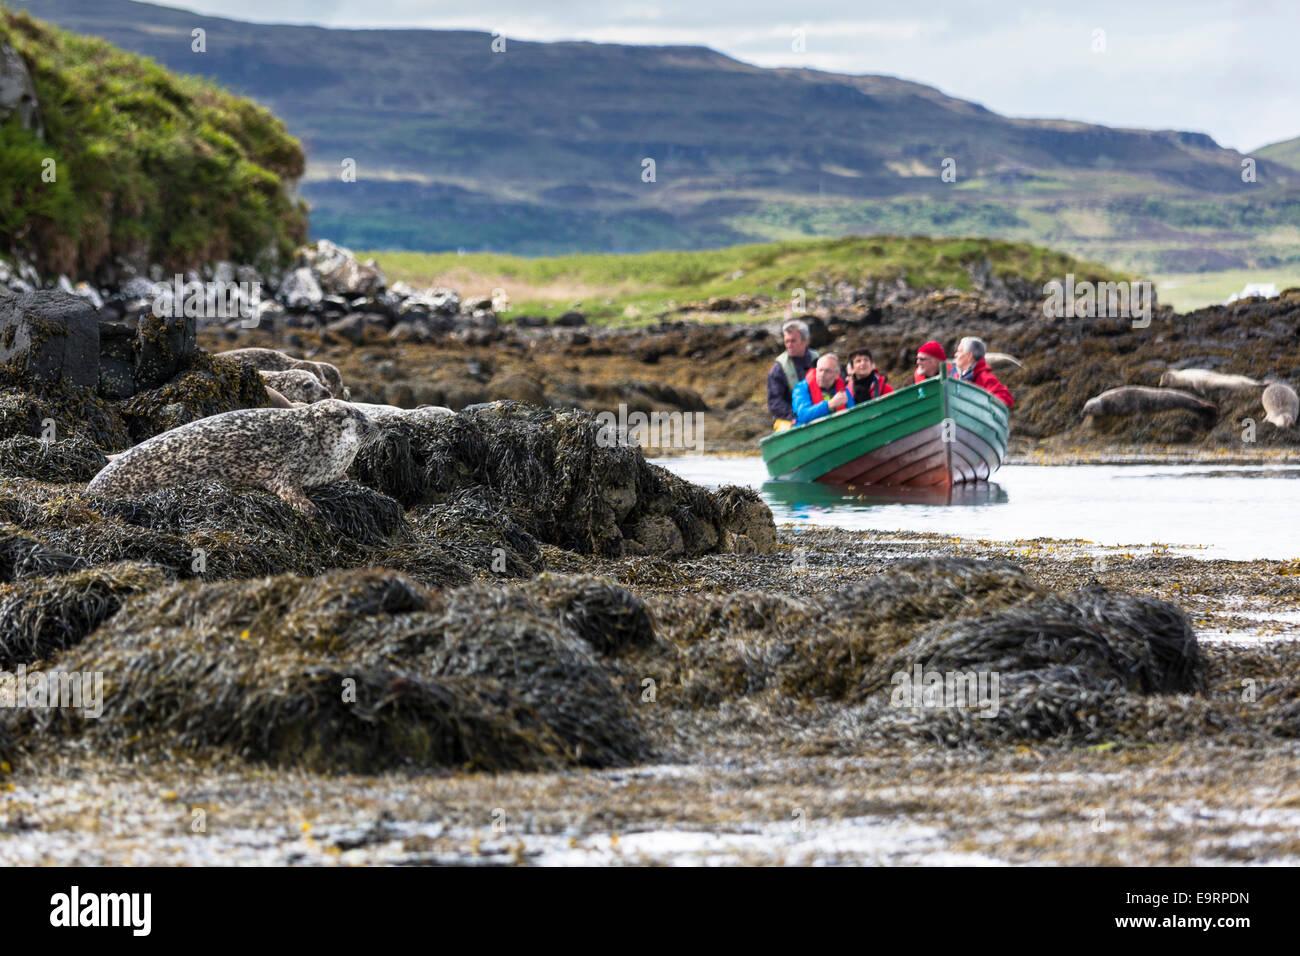 Los turistas de sealwatching viaje en barco para ver precinto o sello común Phoca vitulina Harbour, peregrino, Imagen De Stock